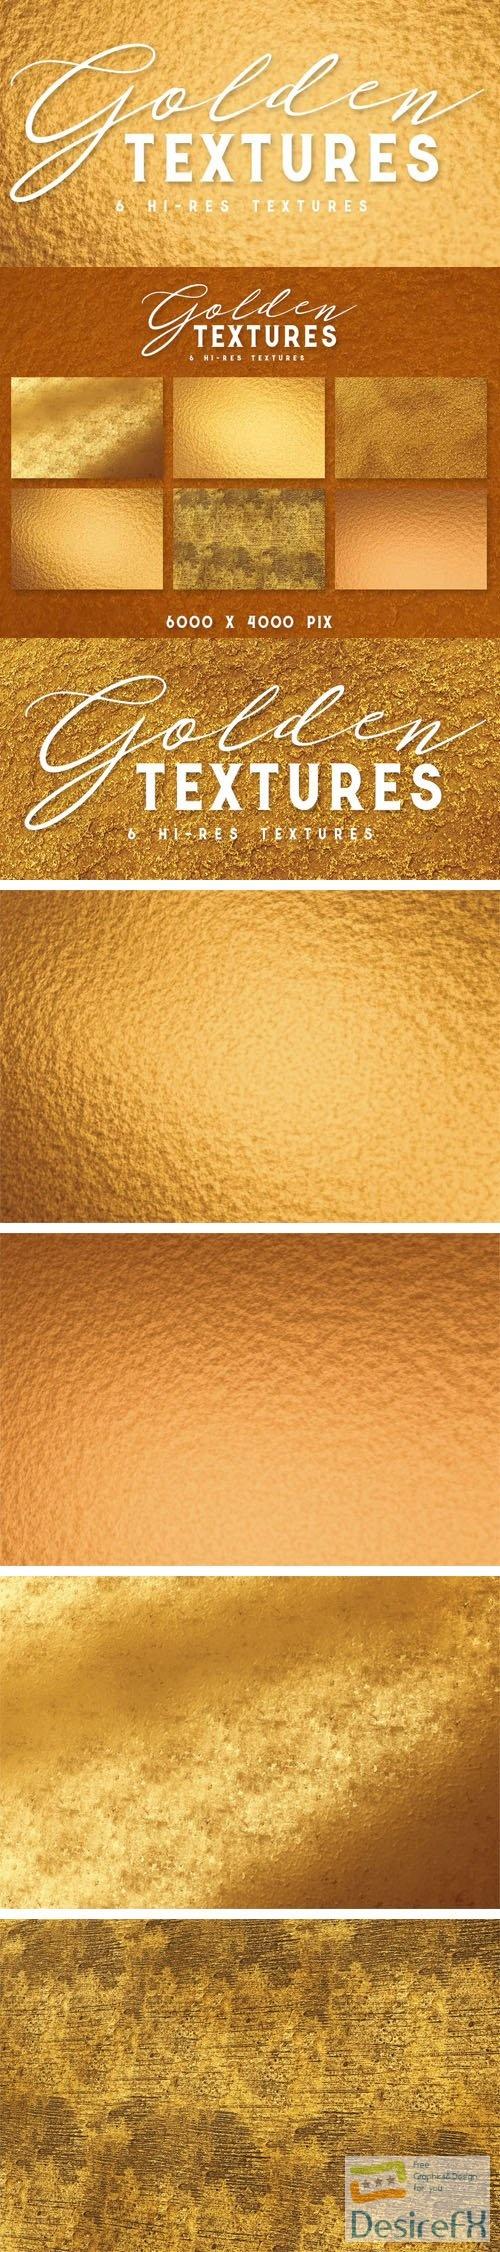 6 Hi-Res Golden Textures Collection